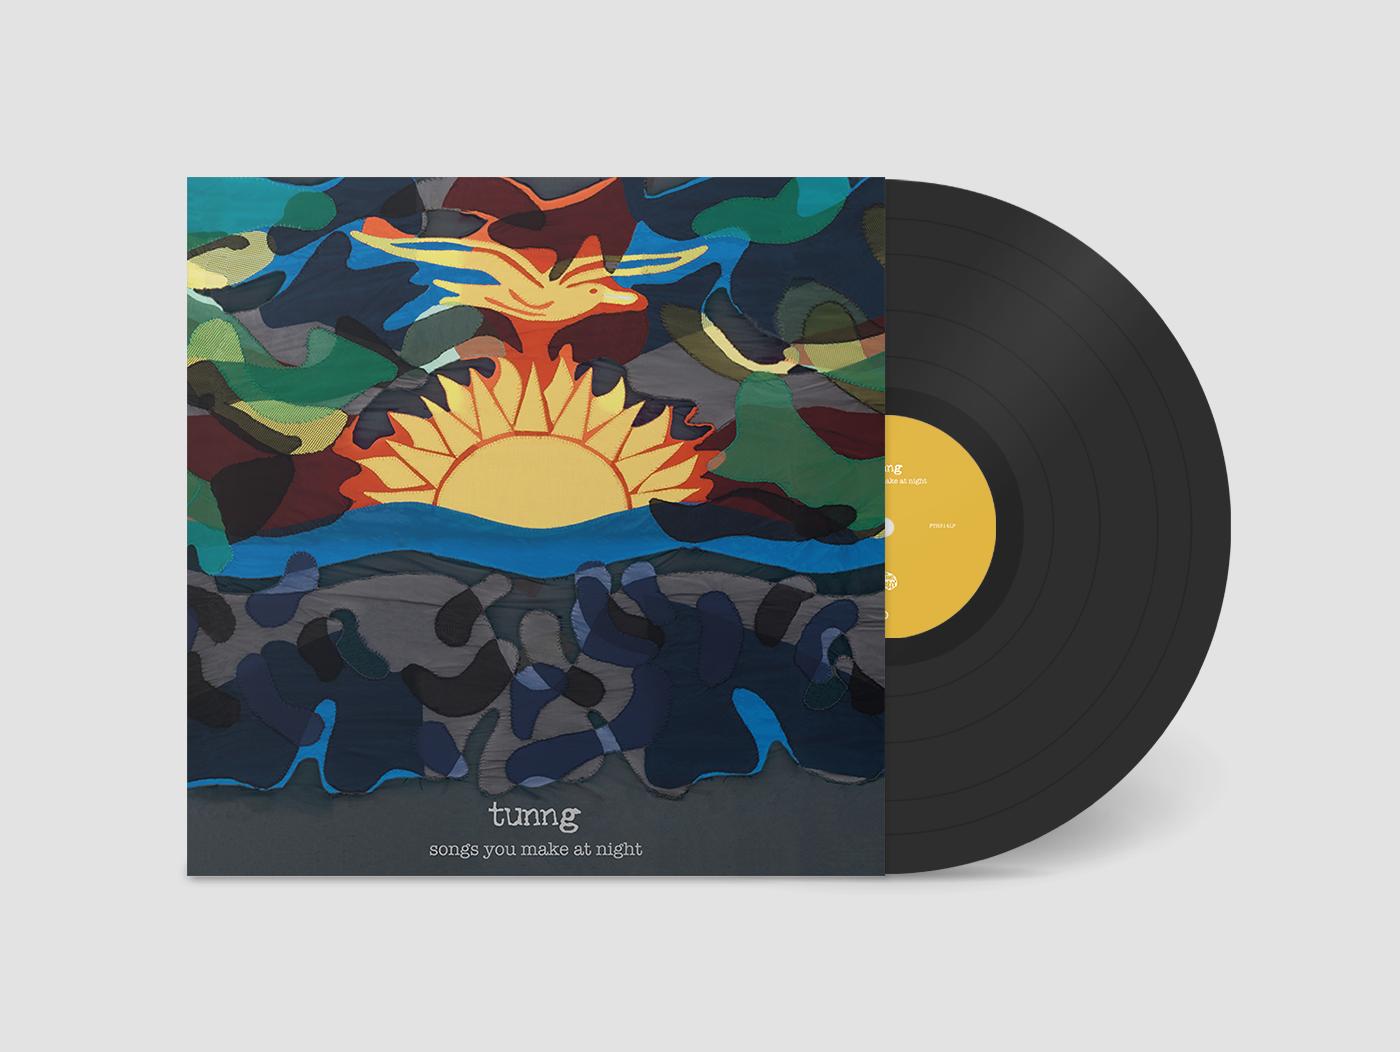 Songs You Make At Night - Black LP - Tunng US